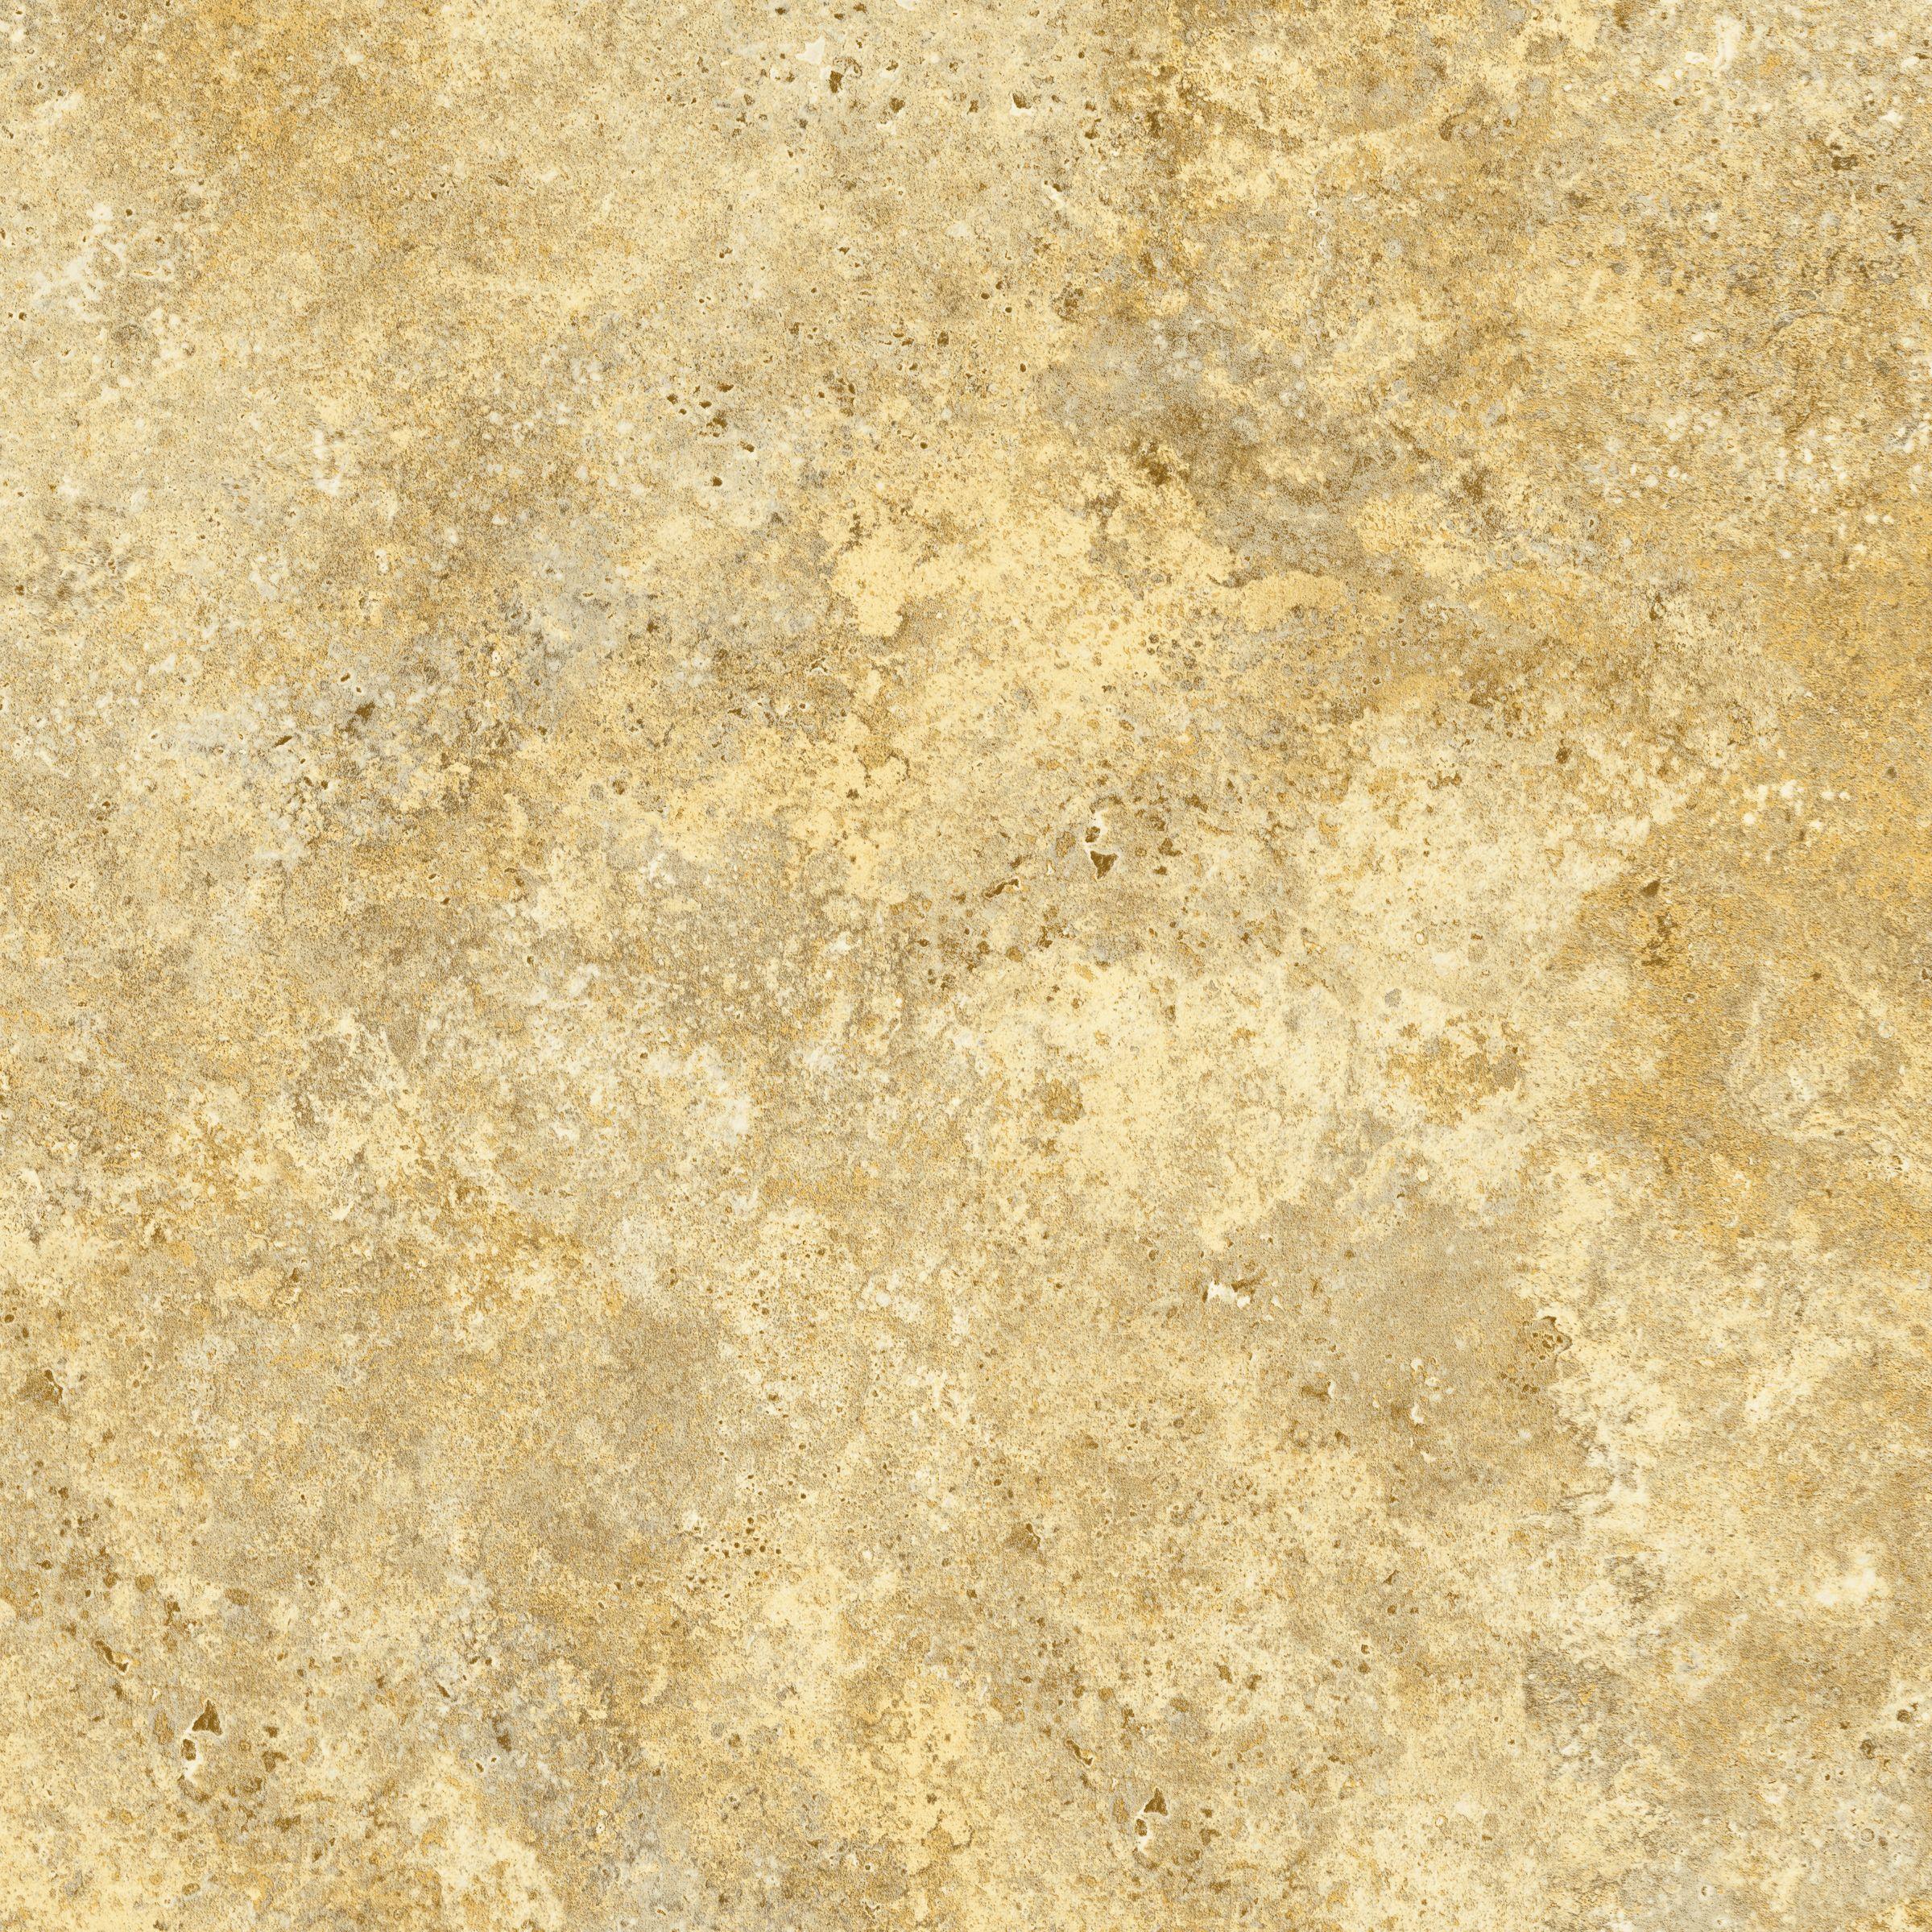 Panele winylowe LVT modulari ® STONE DRYBACK 32,9 x 65,9 cm 36240